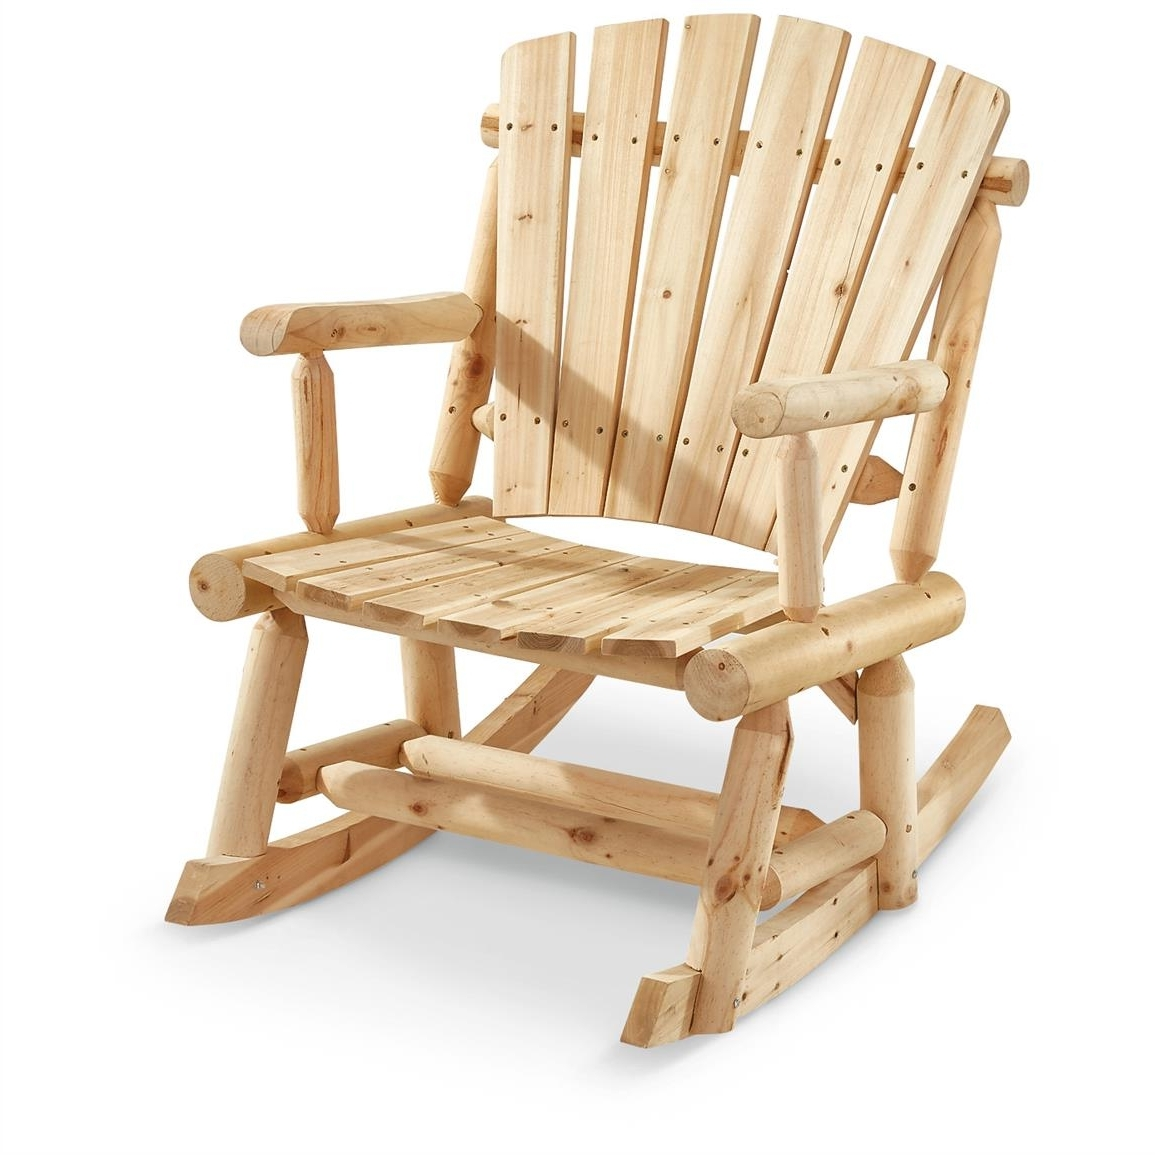 Castlecreek Oversized Adirondack Rocker – 657797, Patio Furniture At Regarding Latest Oversized Patio Rocking Chairs (View 3 of 15)